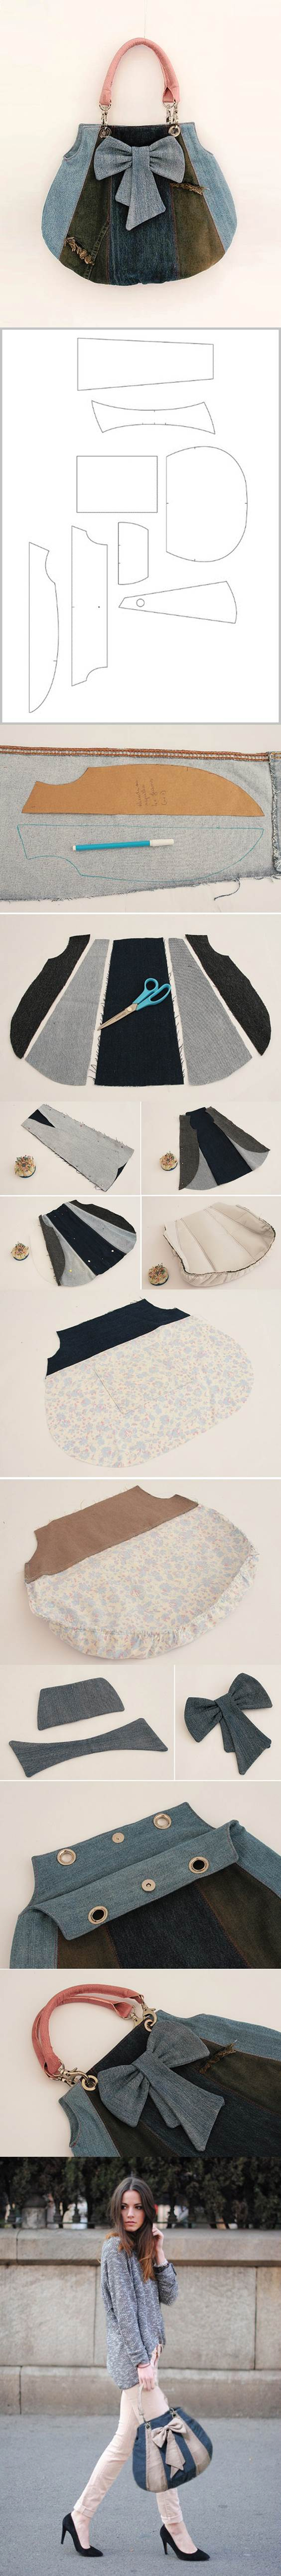 DIY Fashionable Handbag from Old Jeans